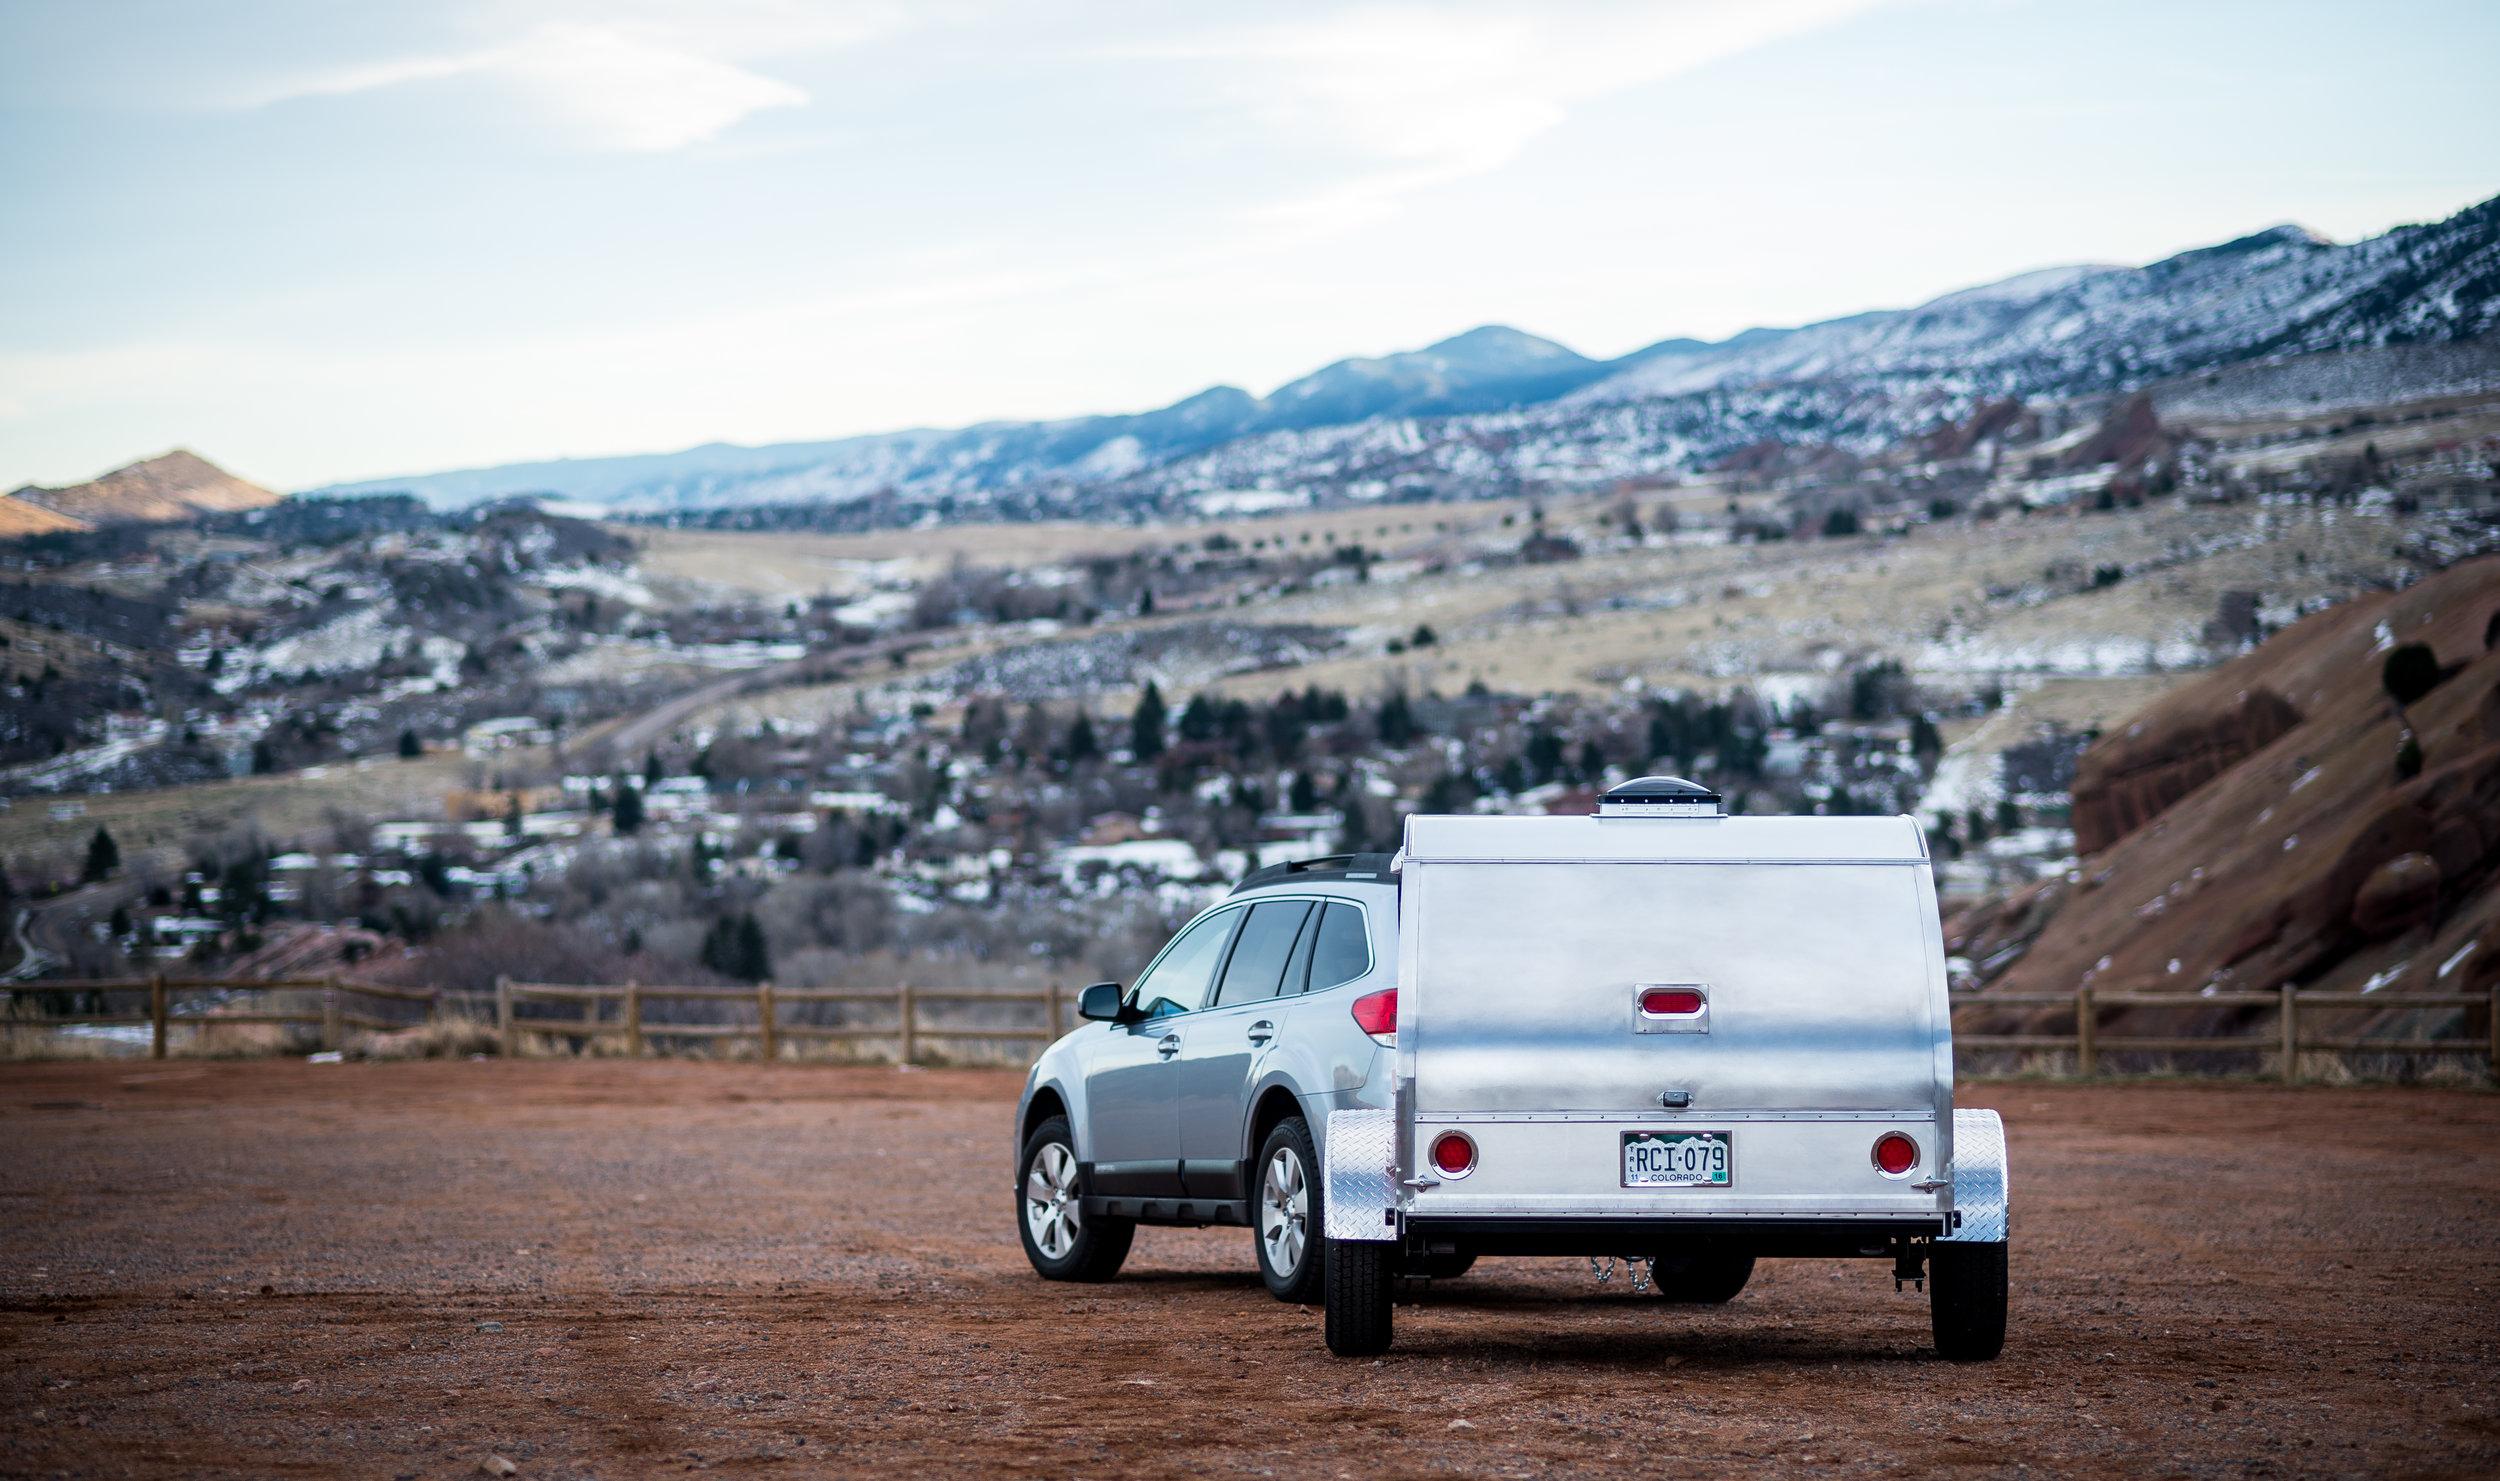 Timberleaf Teardrop Classic Trailer behind a Subaru Outback